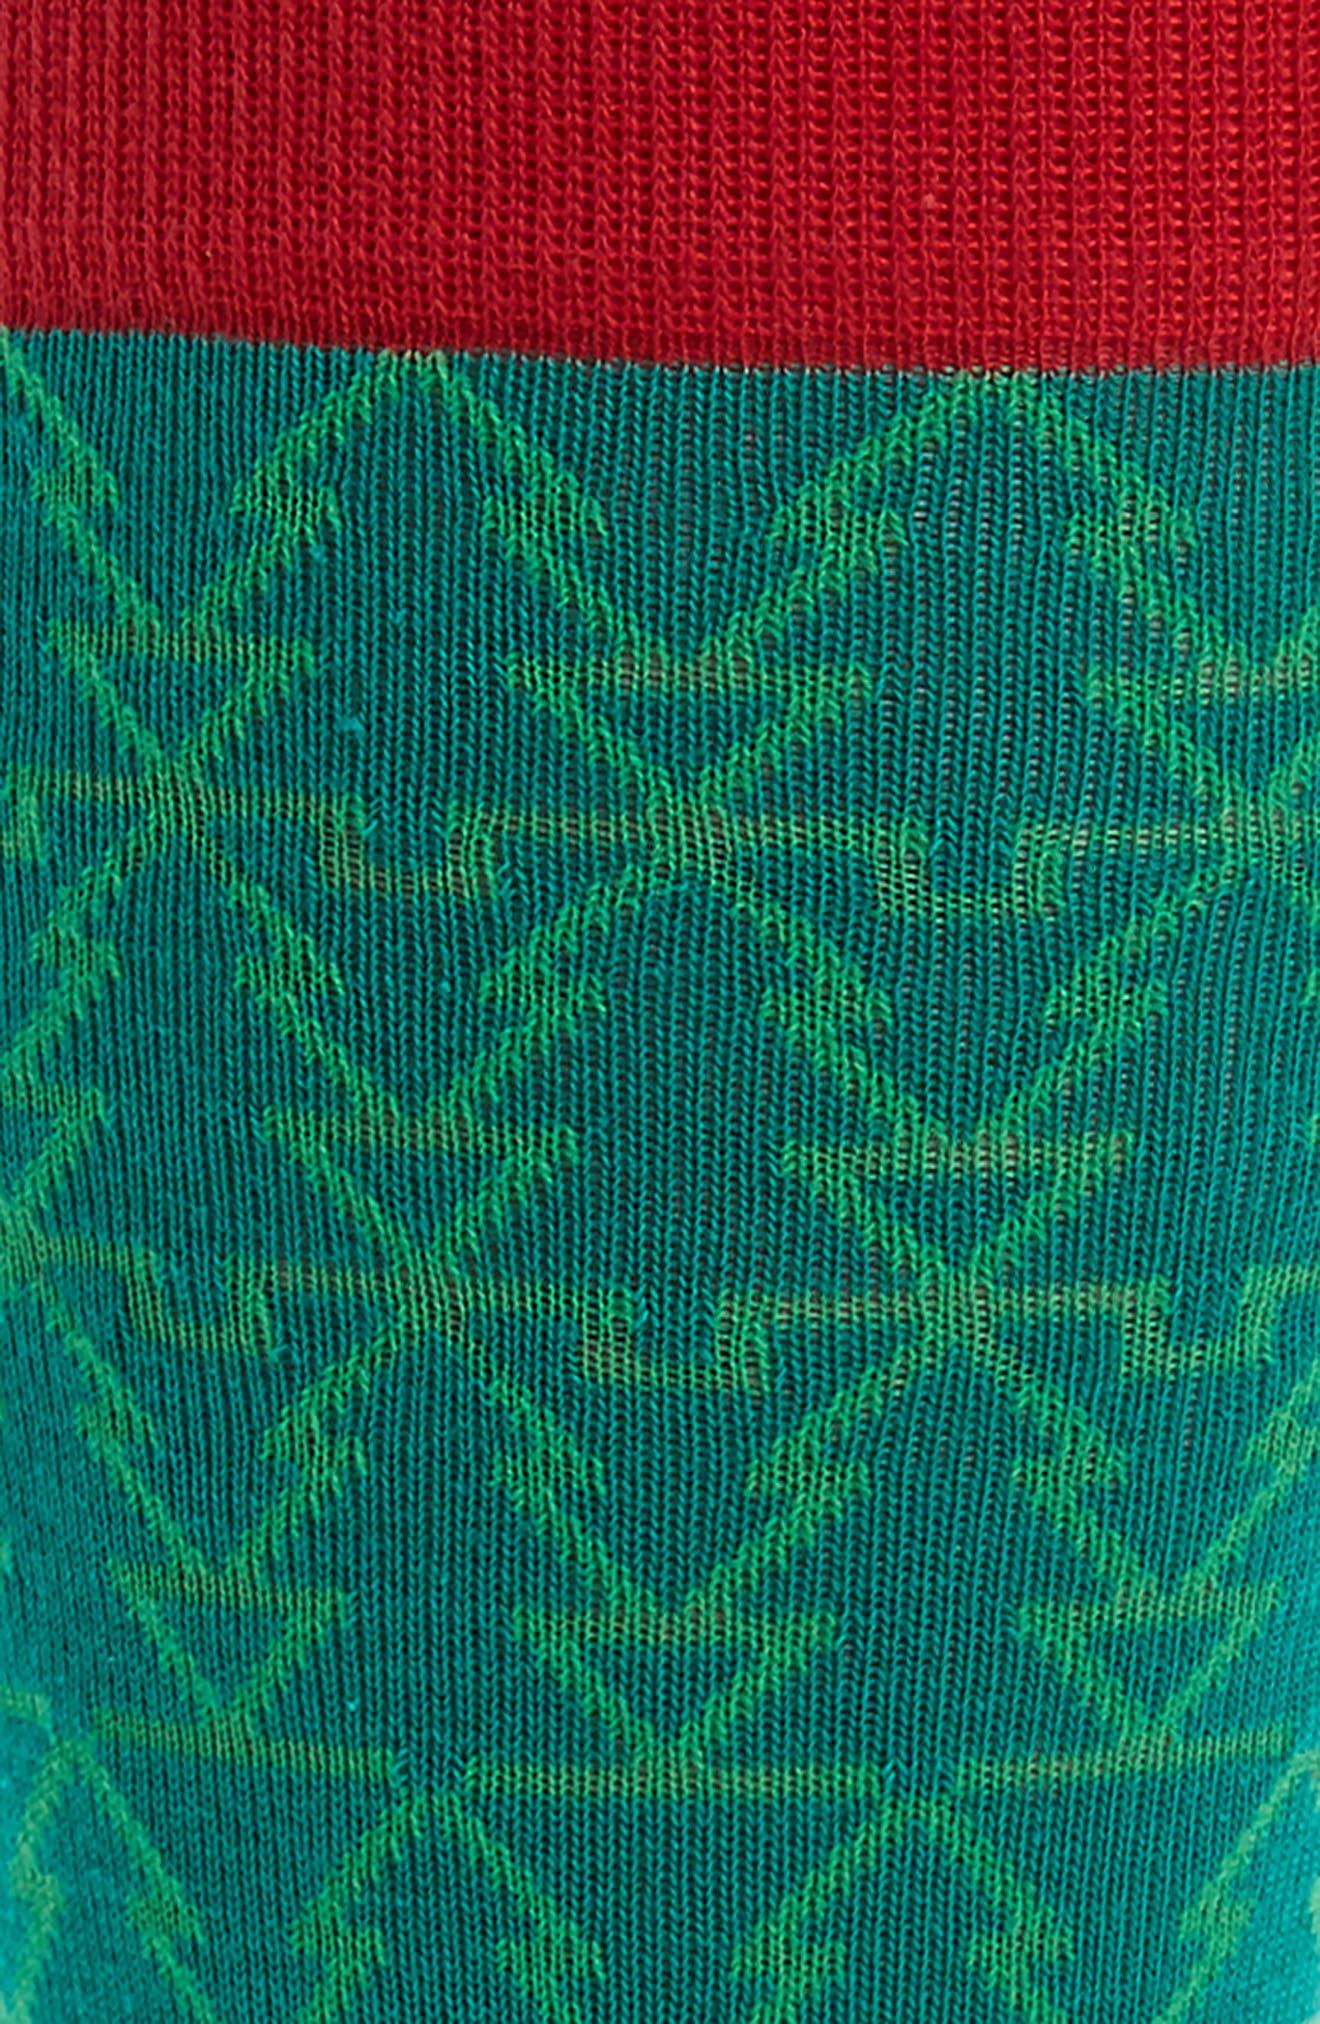 Holiday Mosaic Tree Socks,                             Alternate thumbnail 2, color,                             310